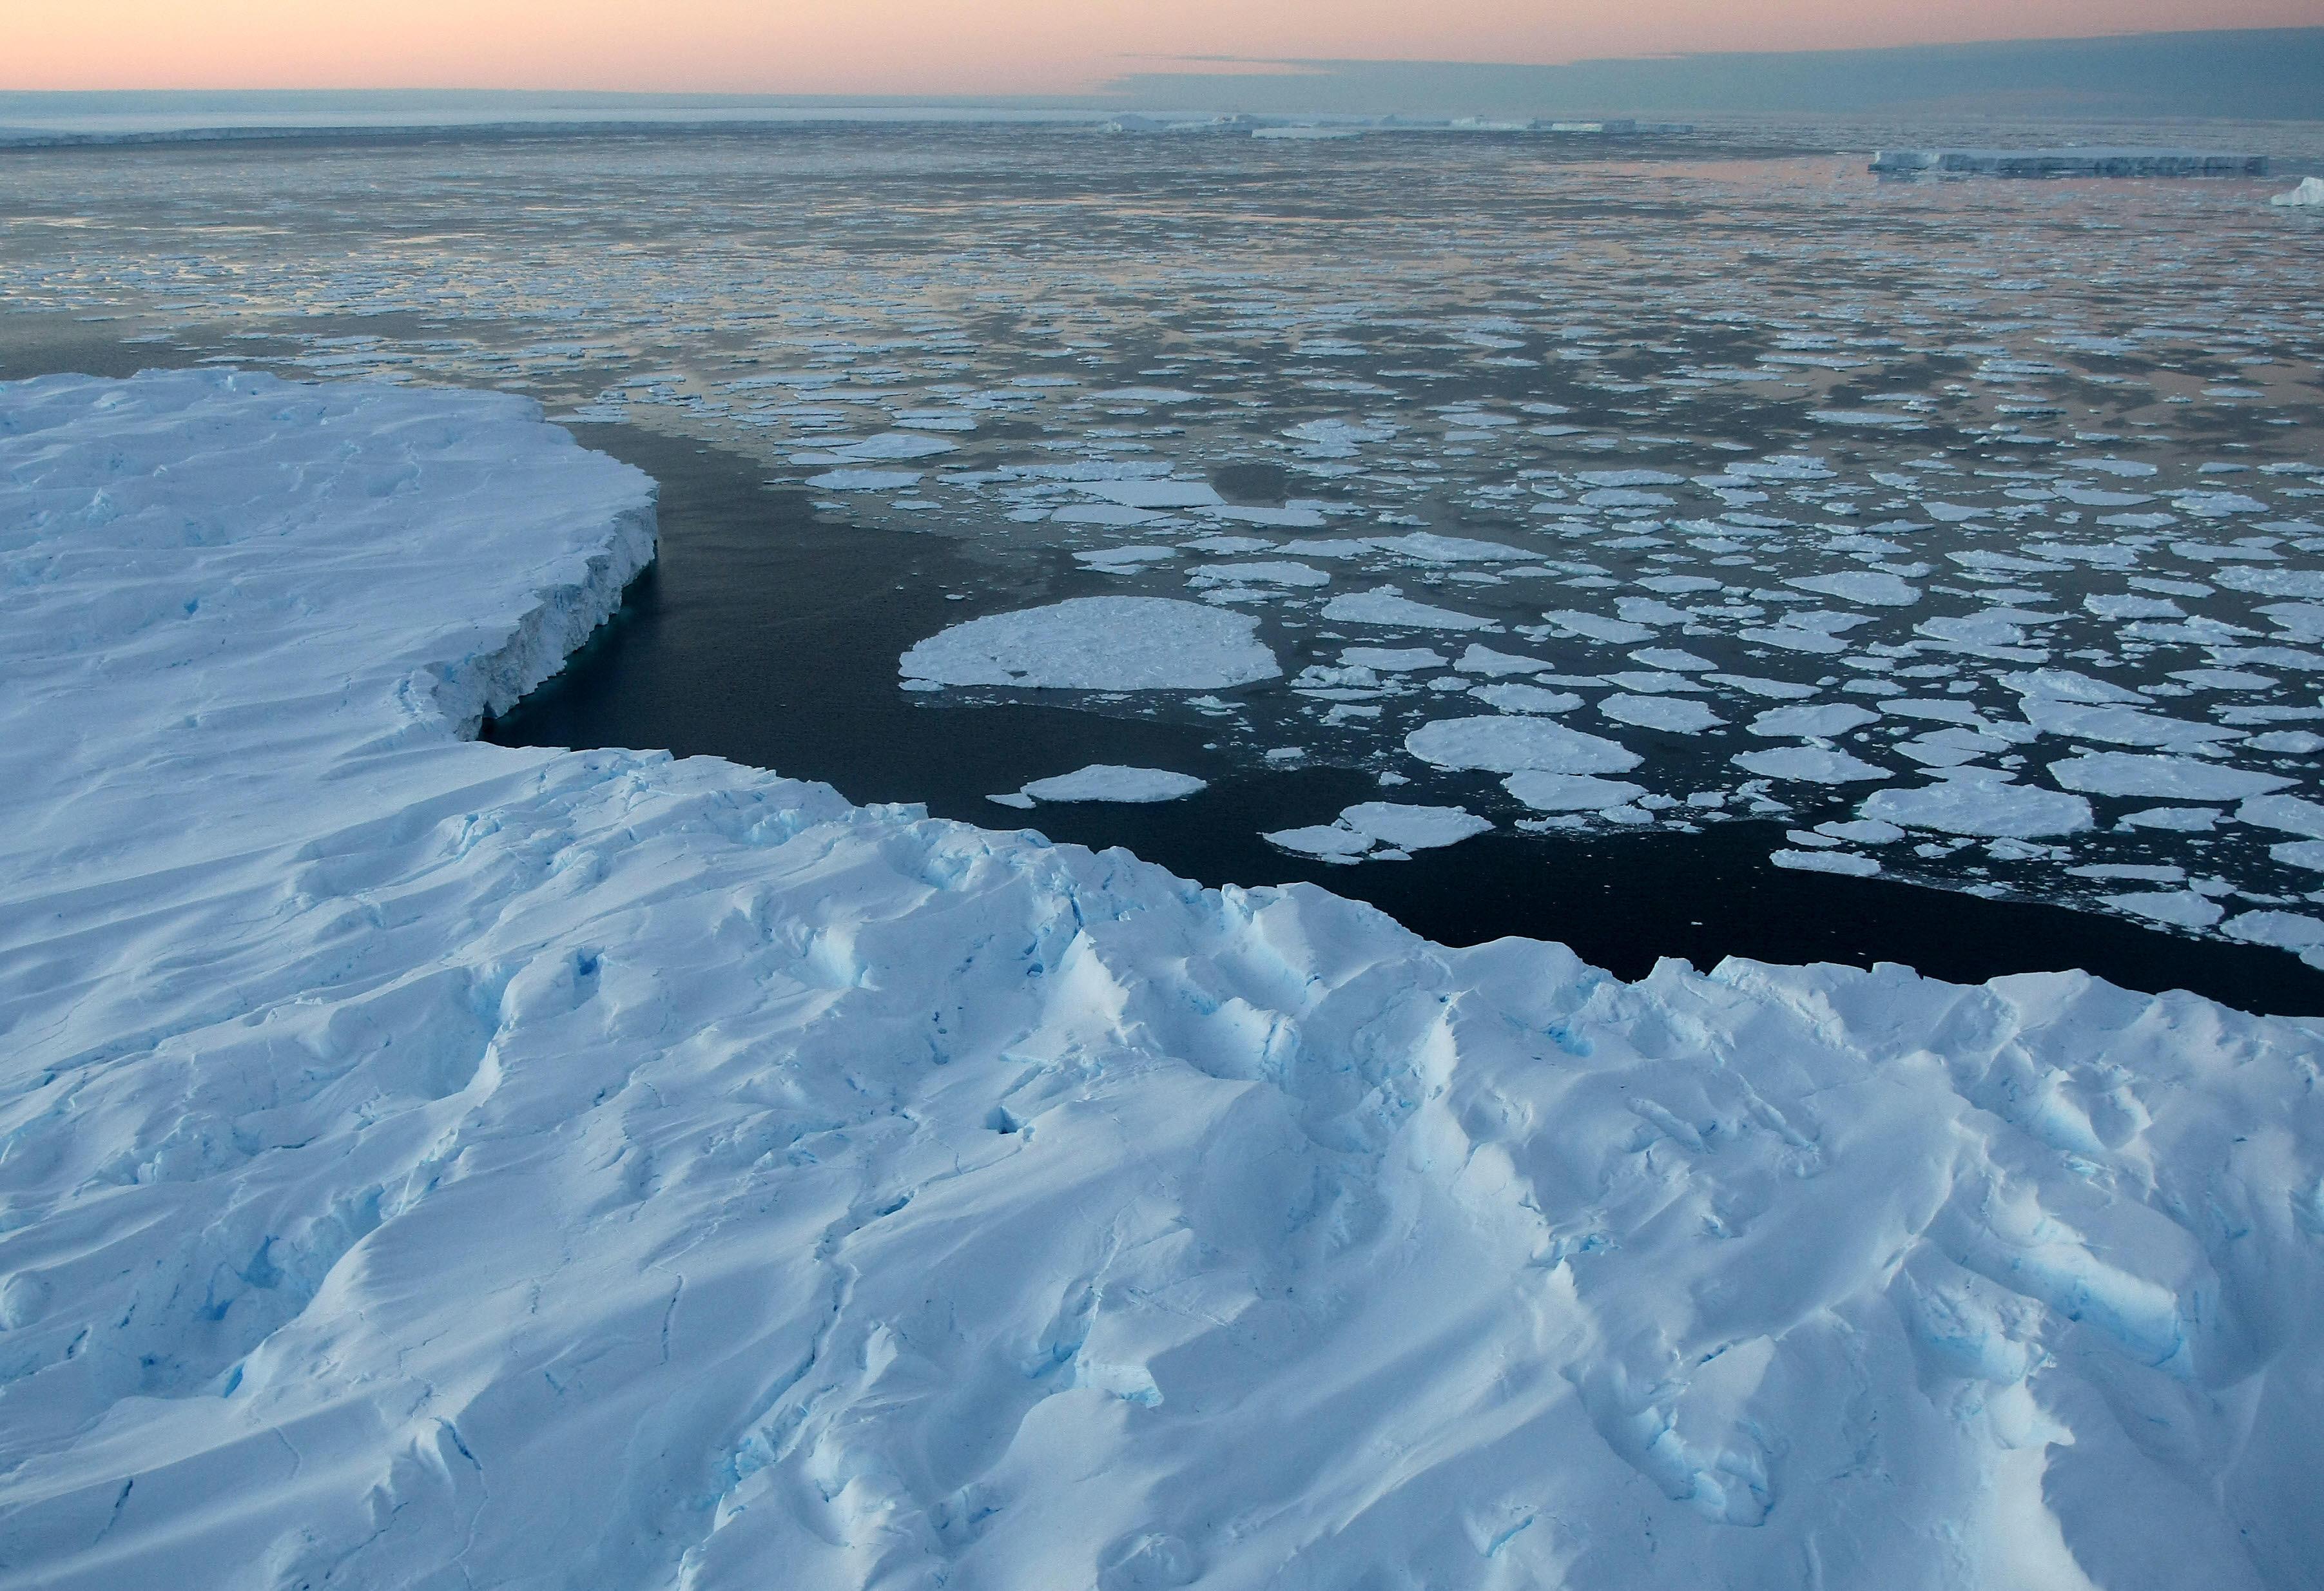 Global warming, climate change, iceberg,